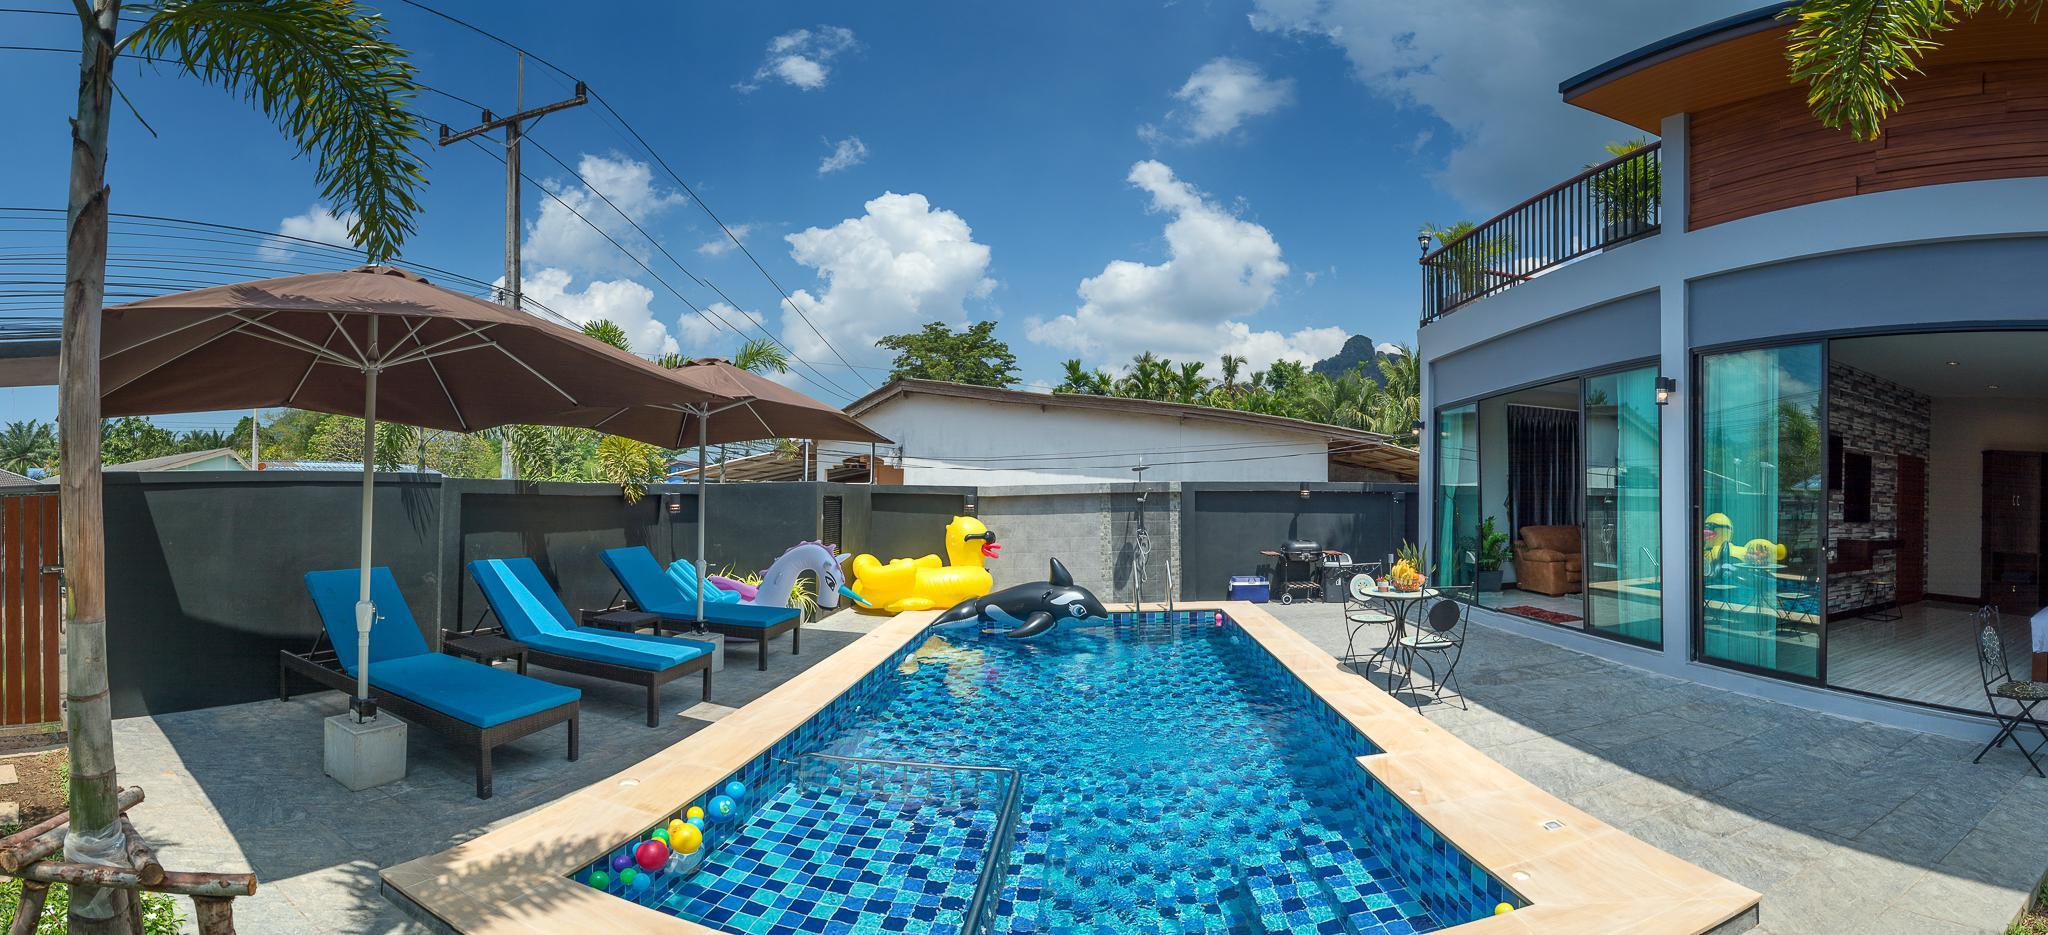 De Nathai Private Pool Villa วิลลา 3 ห้องนอน 3 ห้องน้ำส่วนตัว ขนาด 220 ตร.ม. – อ่าวนาง